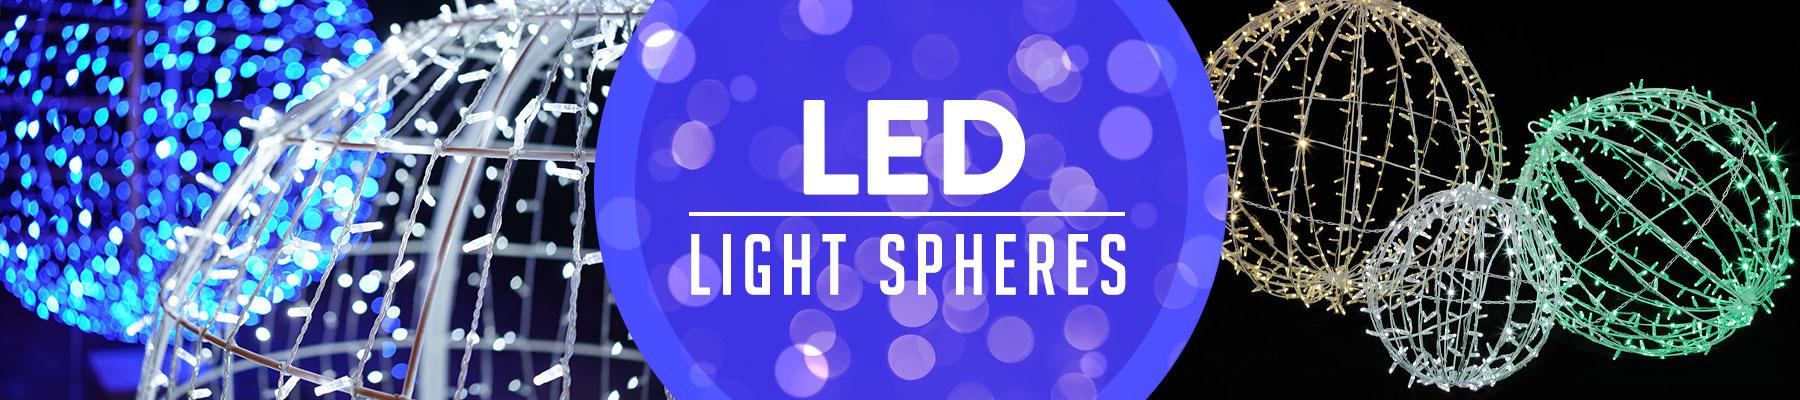 Foldable LED 3D Spheres